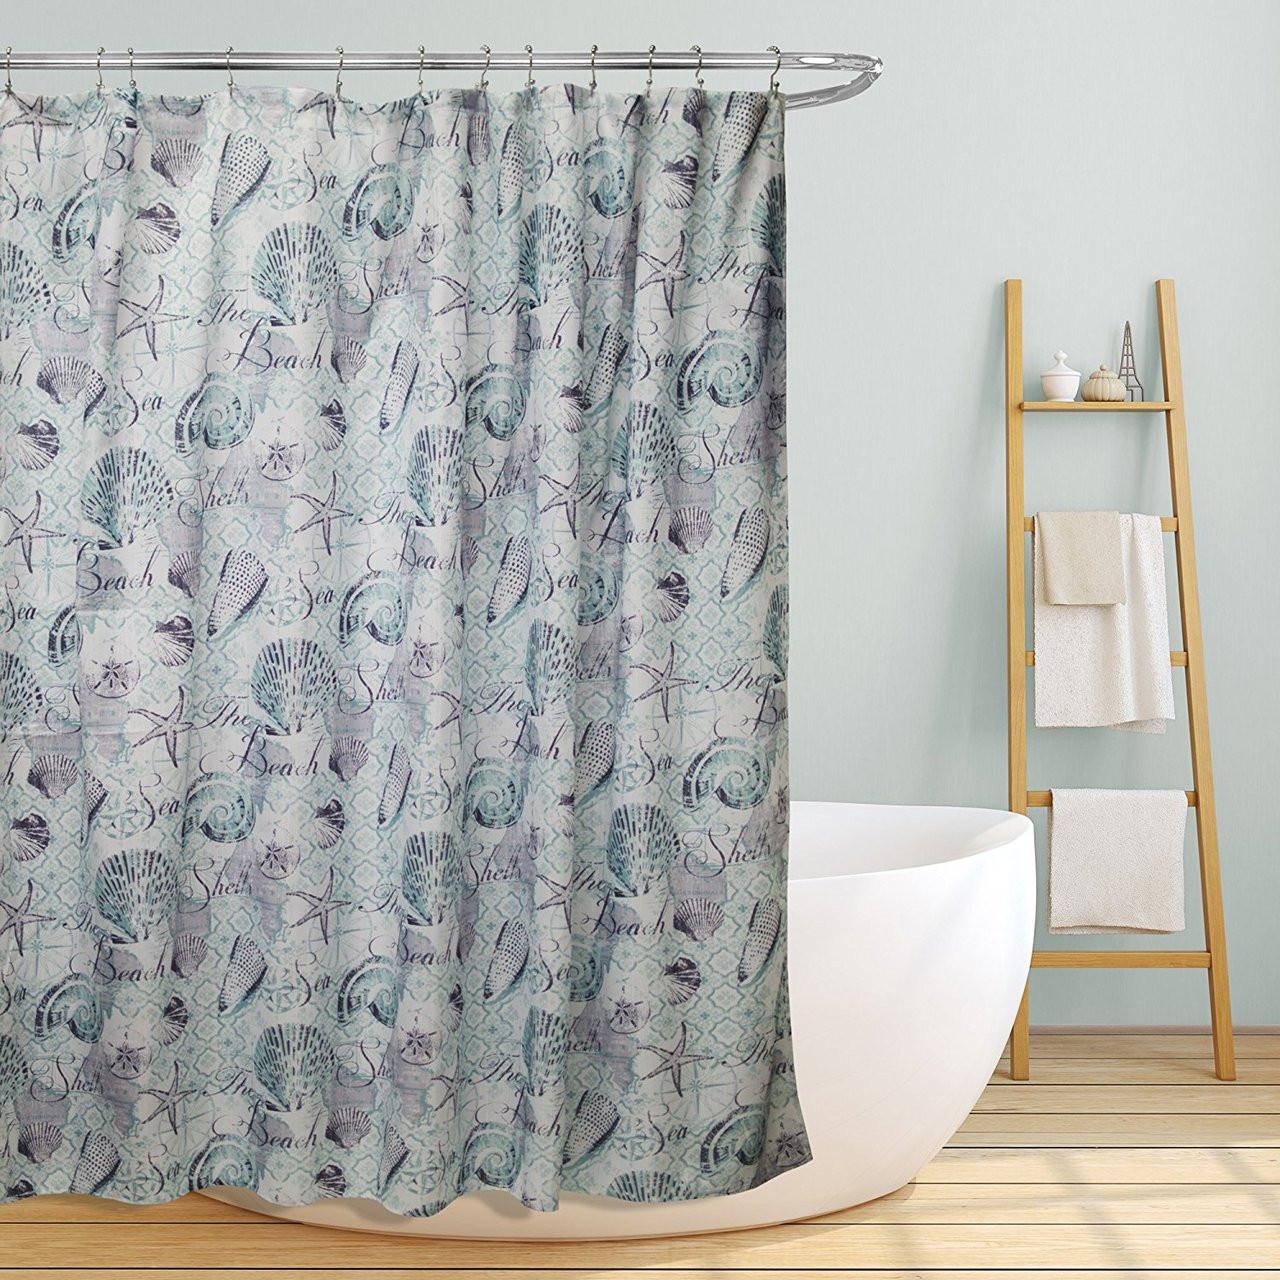 Linen Store Fabric Canvas Shower Curtain 70x70 Marina Beach